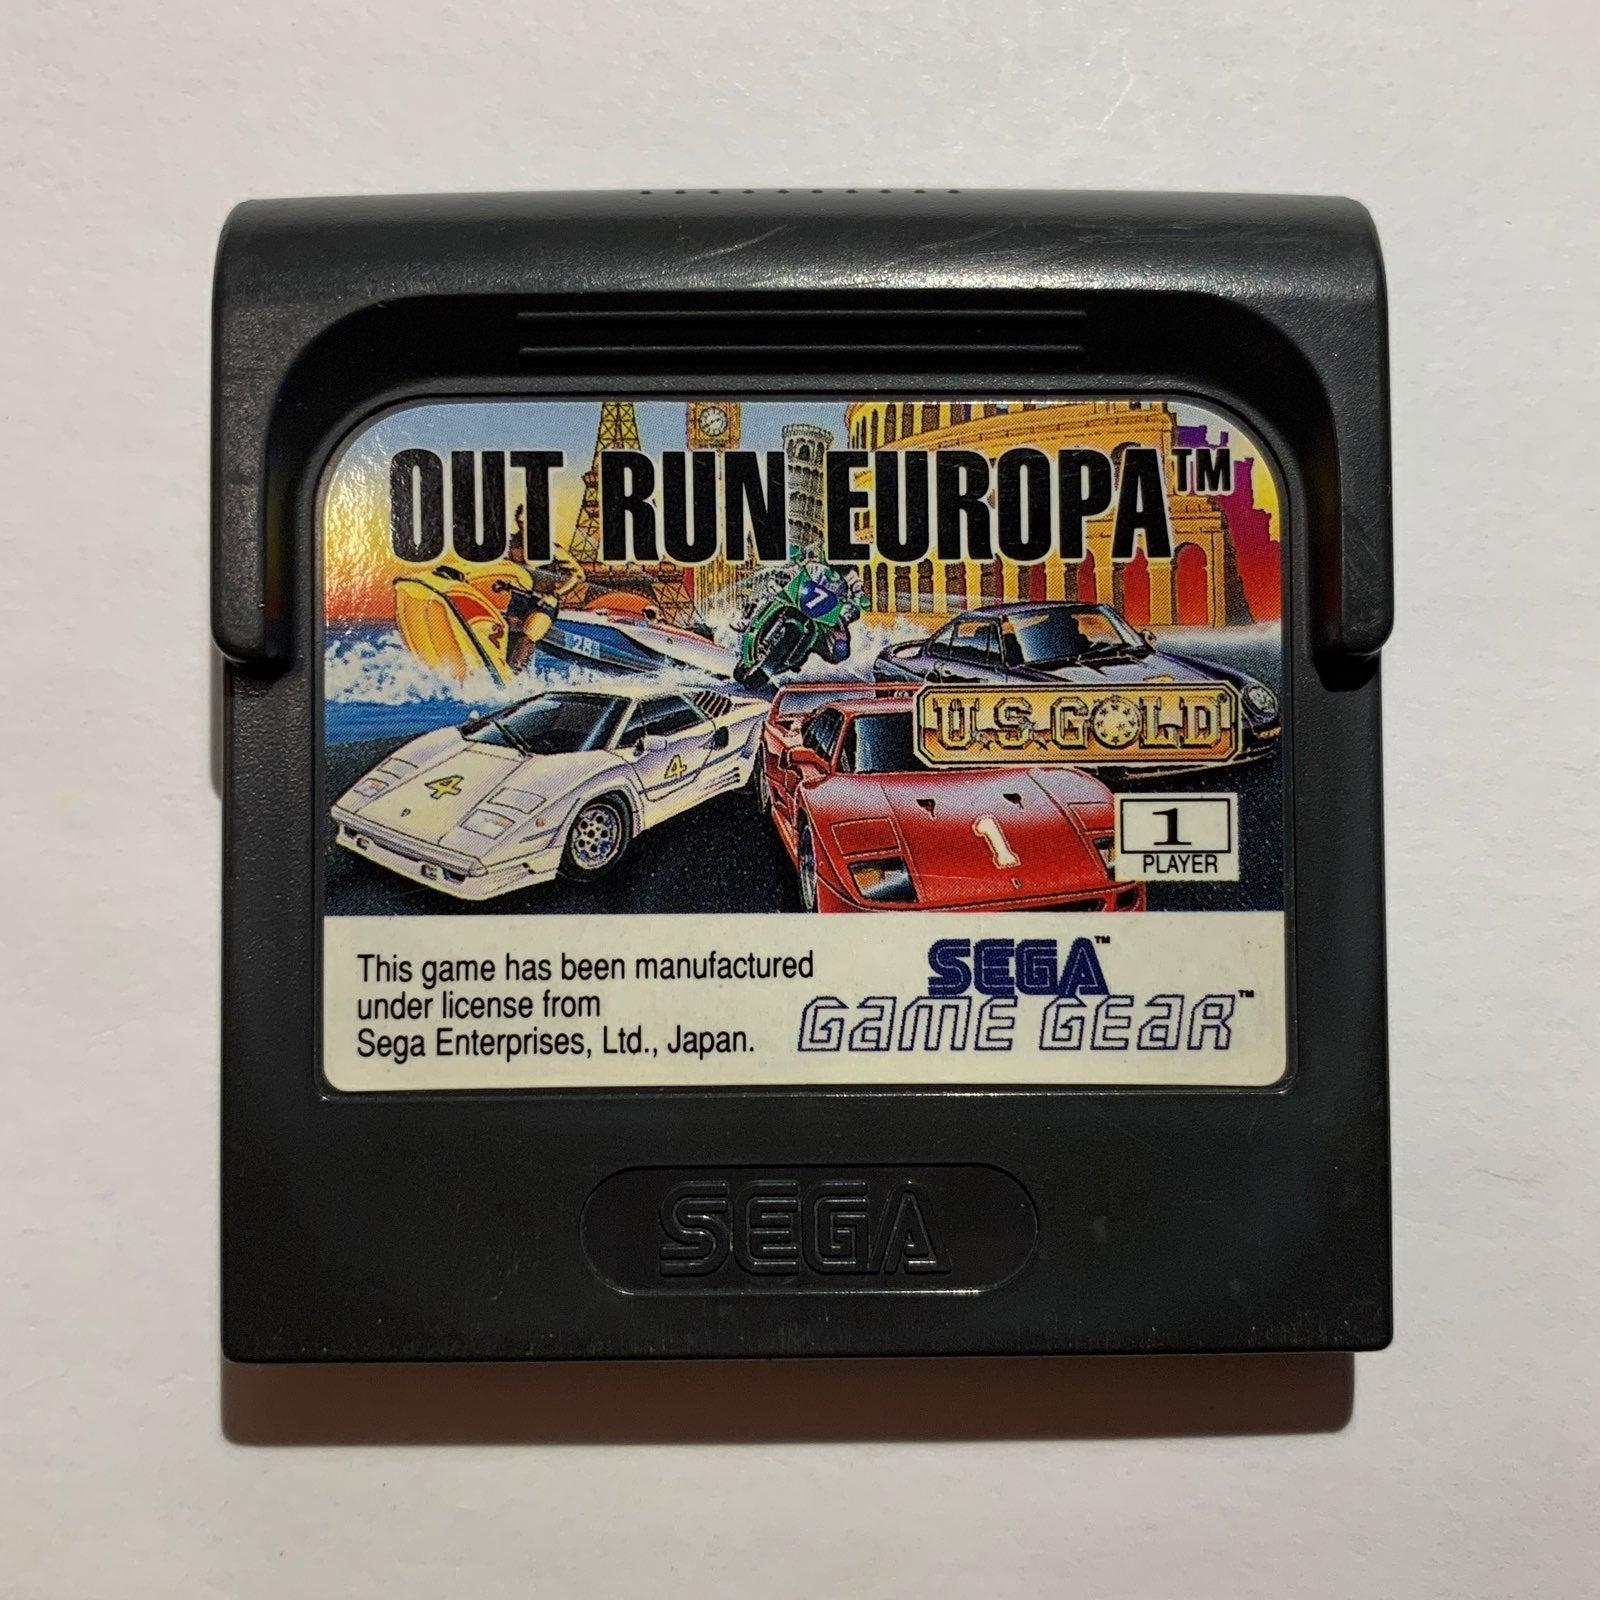 Out Run Europa on Sega Game Gear